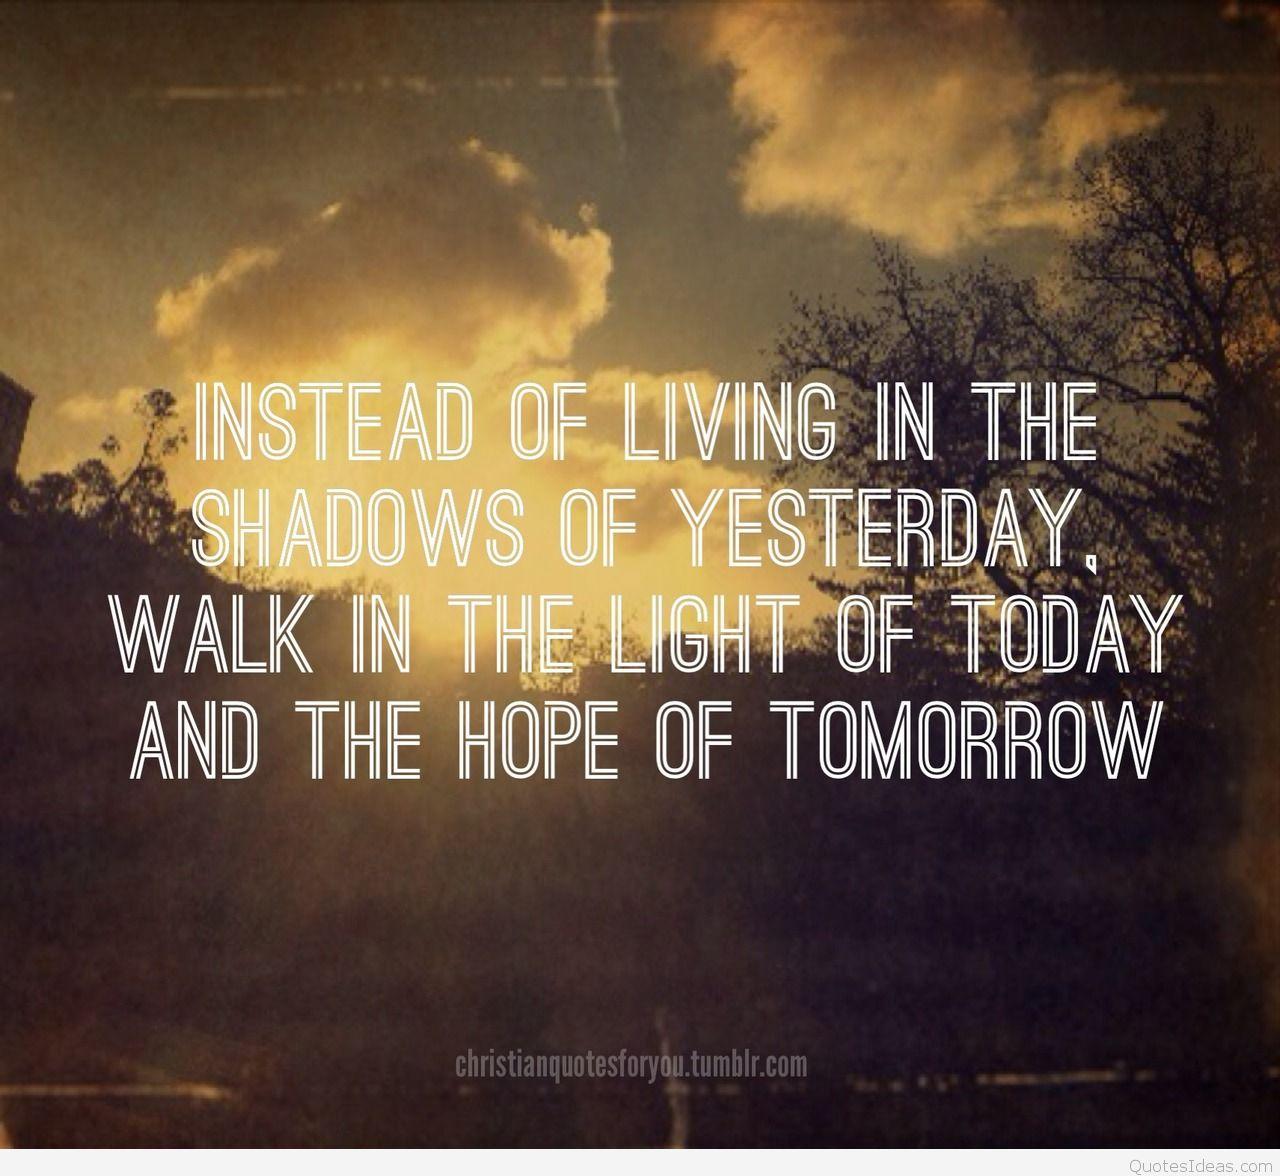 189 1897514 motivational bible quotes tumblr with amazing inspiring muqtada